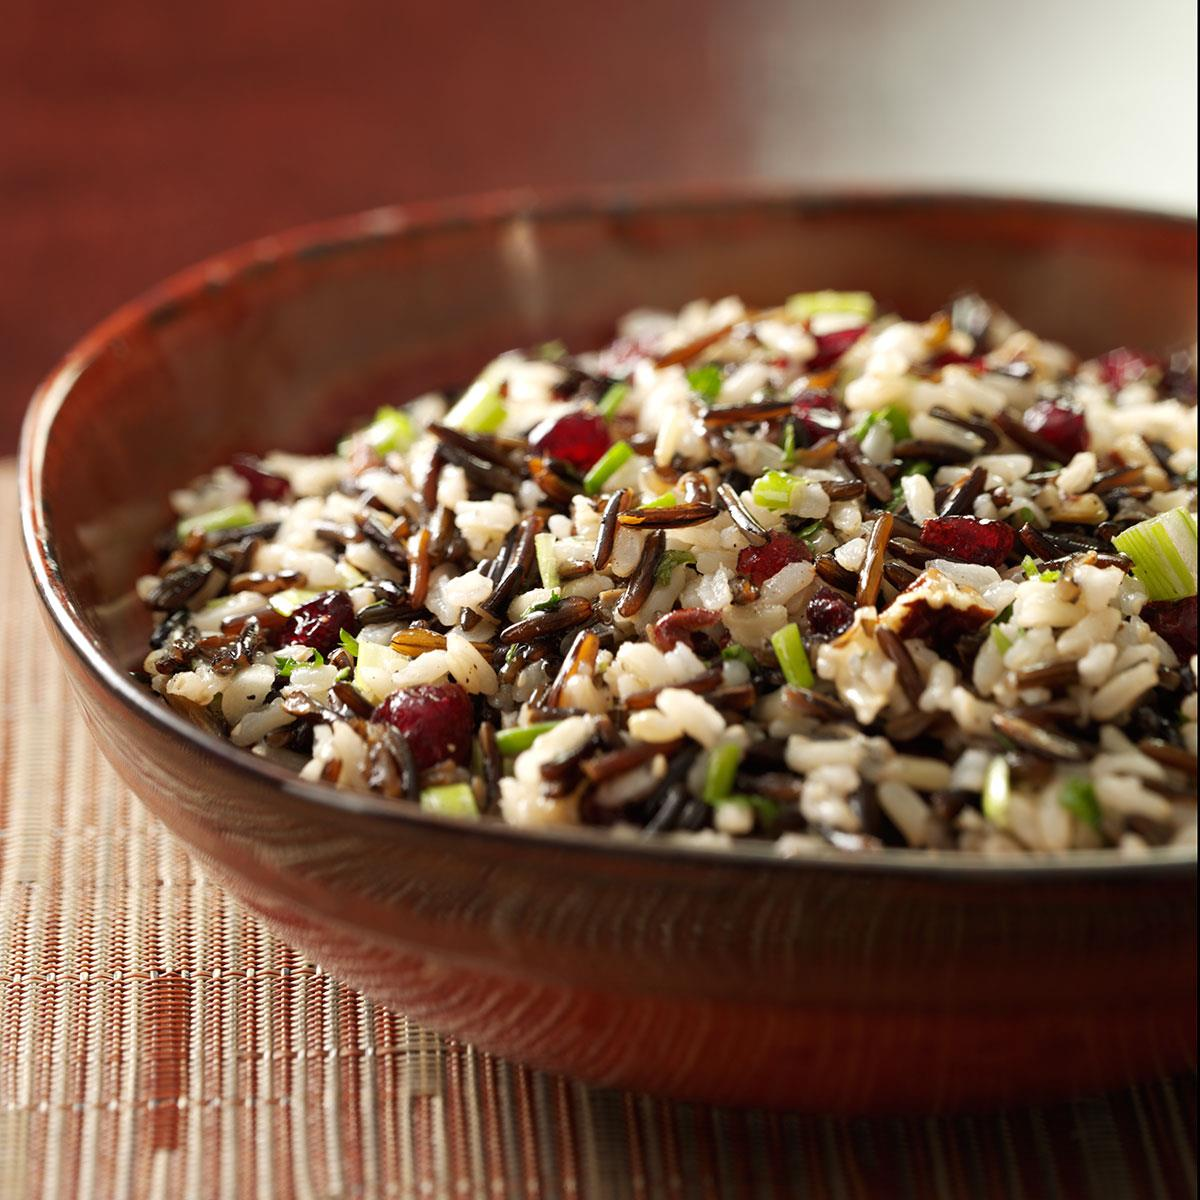 Brown and Wild Rice Salad image